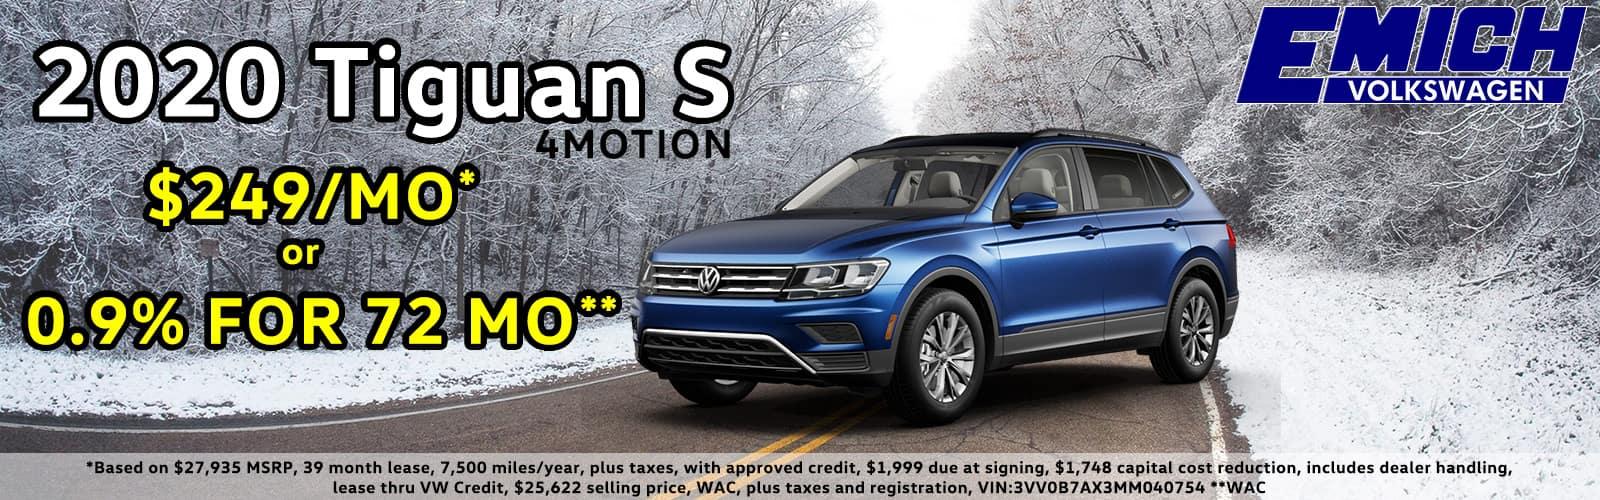 2020 VW Tiguan Special Deal